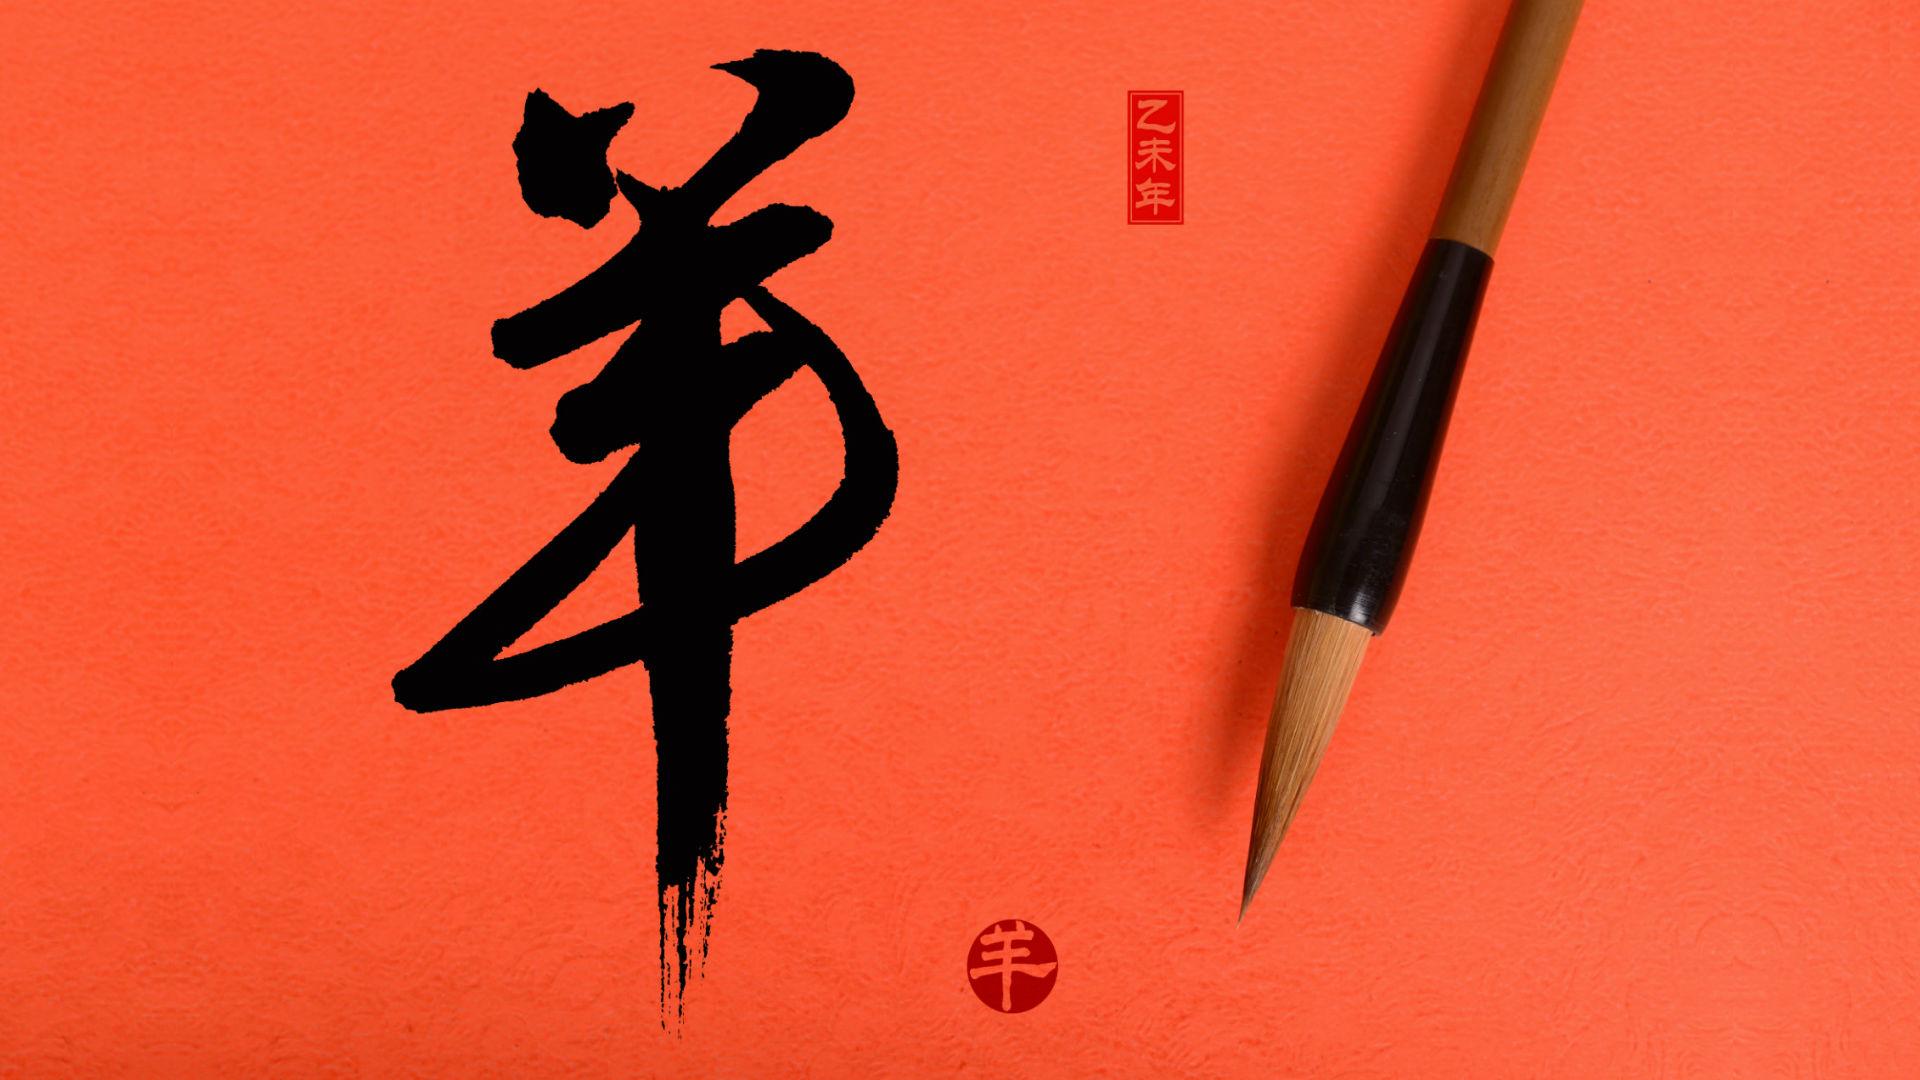 Fall Autumn Hd Wallpaper 1920x1080 Calligraphy Backgrounds Free Download Pixelstalk Net